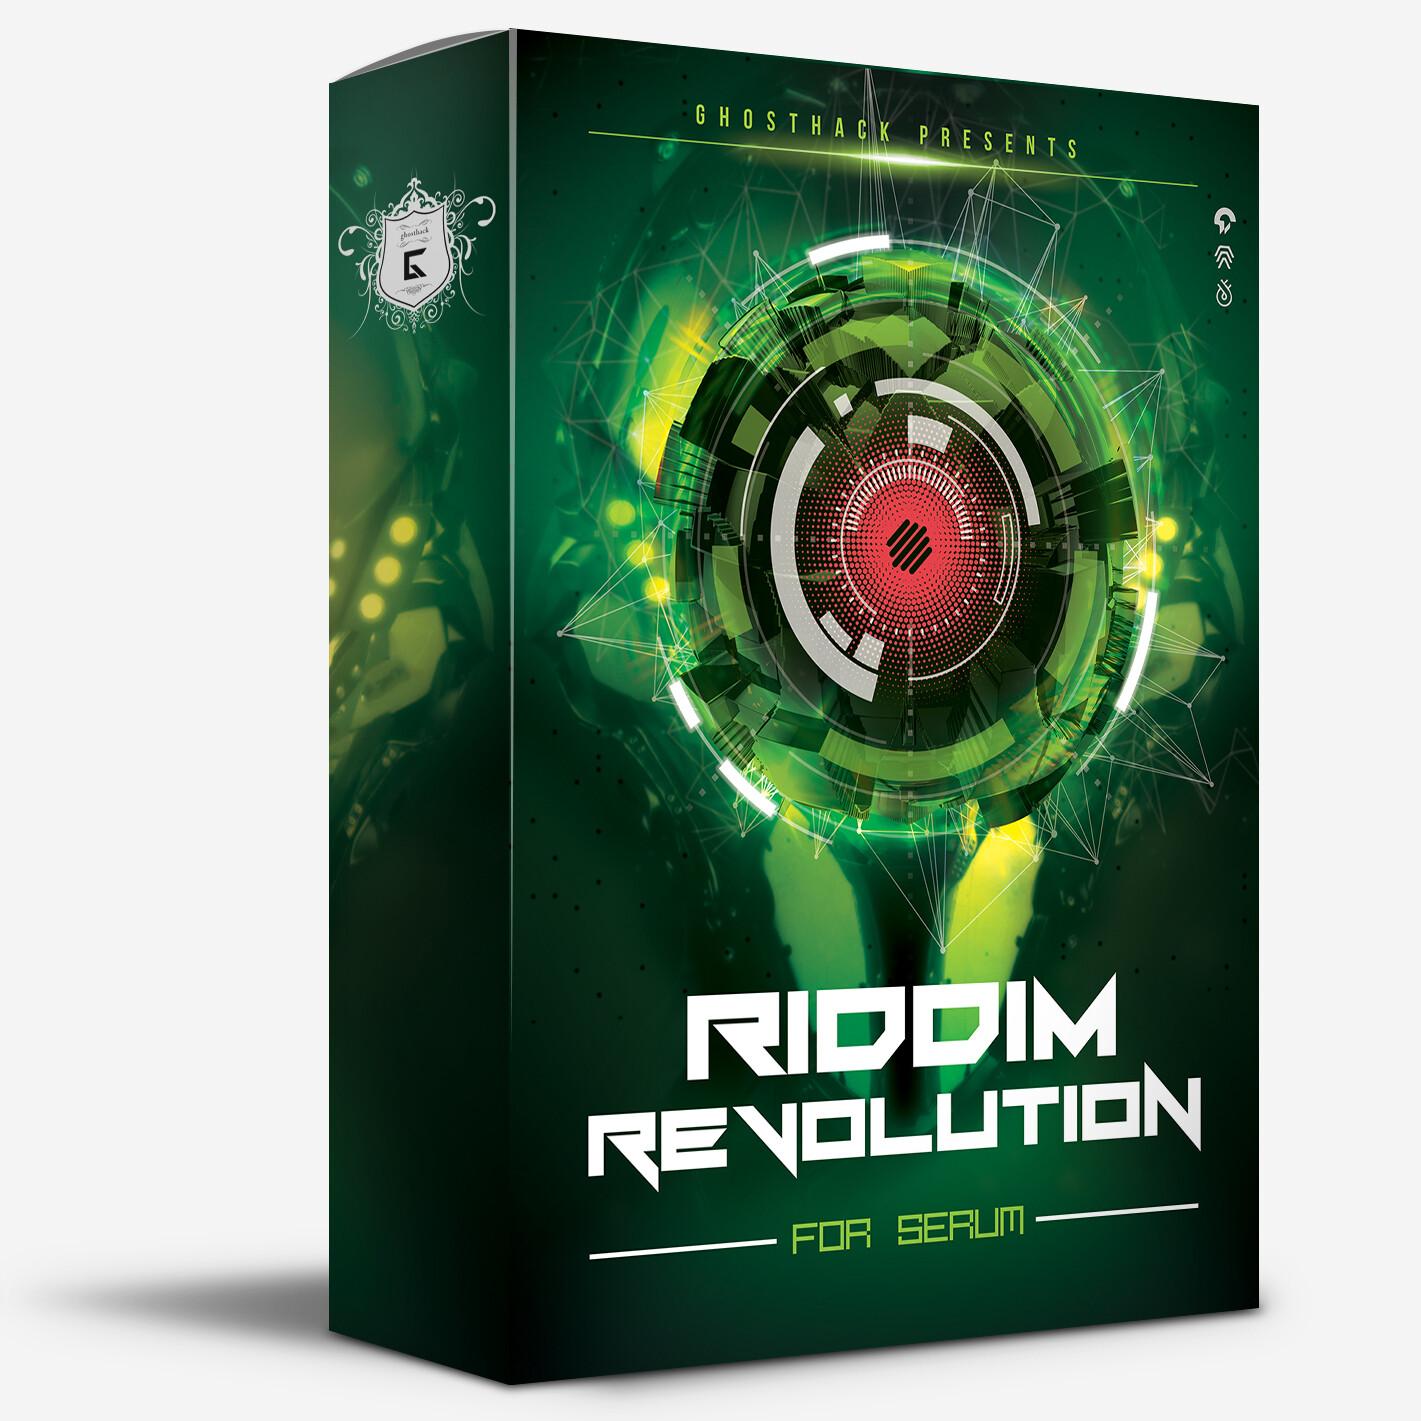 Riddim Revolution for Serum